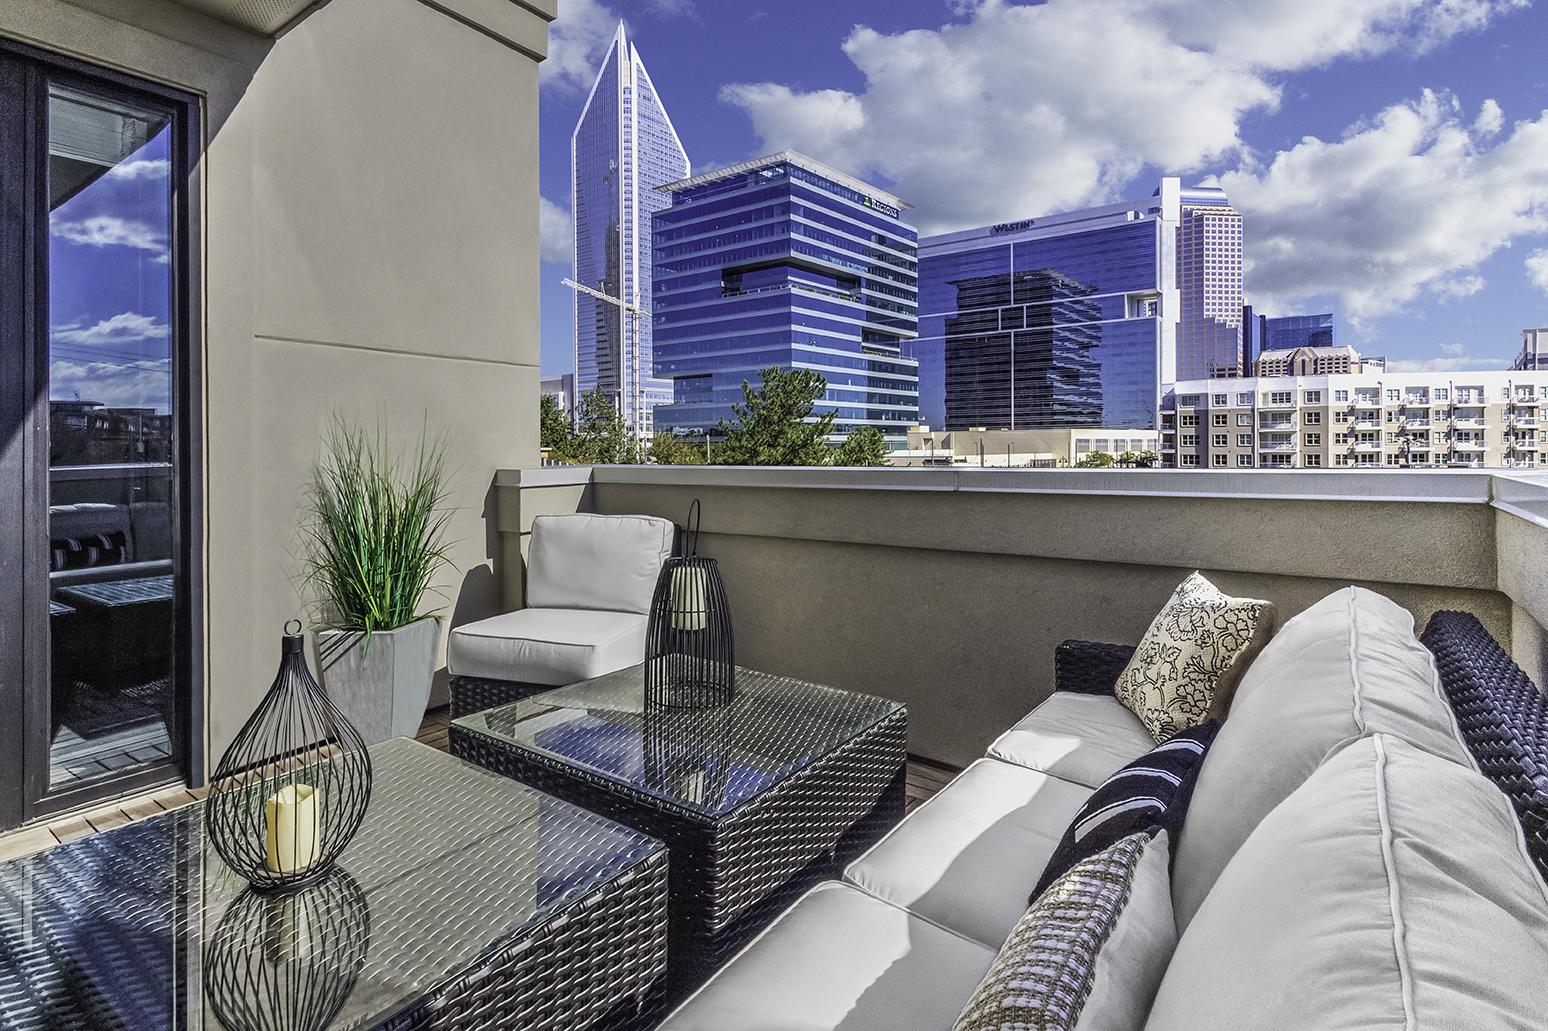 camden-grandview-townhomes-charlotte-nc-rooftop-terrace.jpg